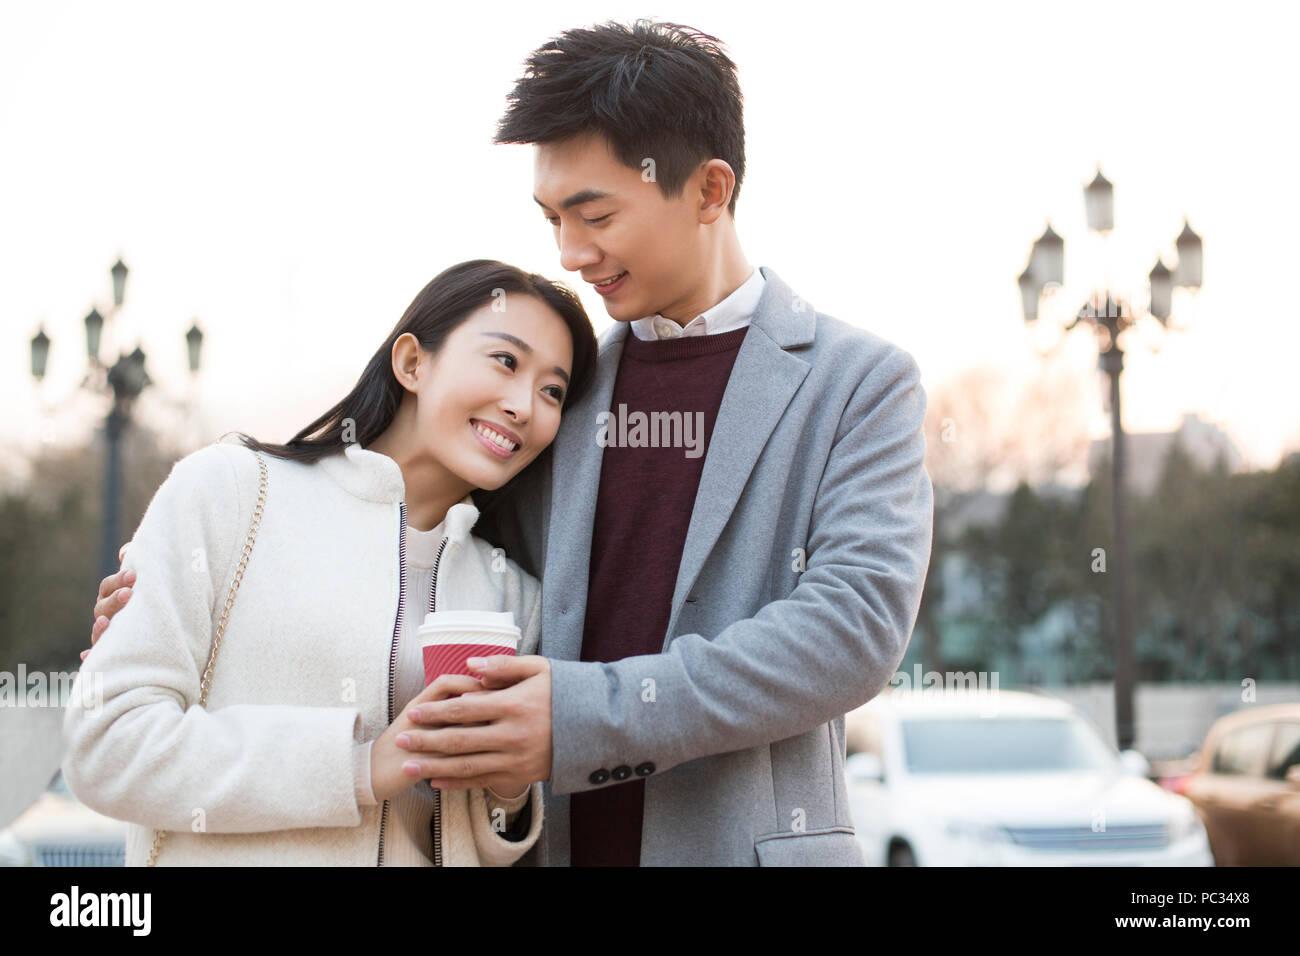 Chinees en zwart dating